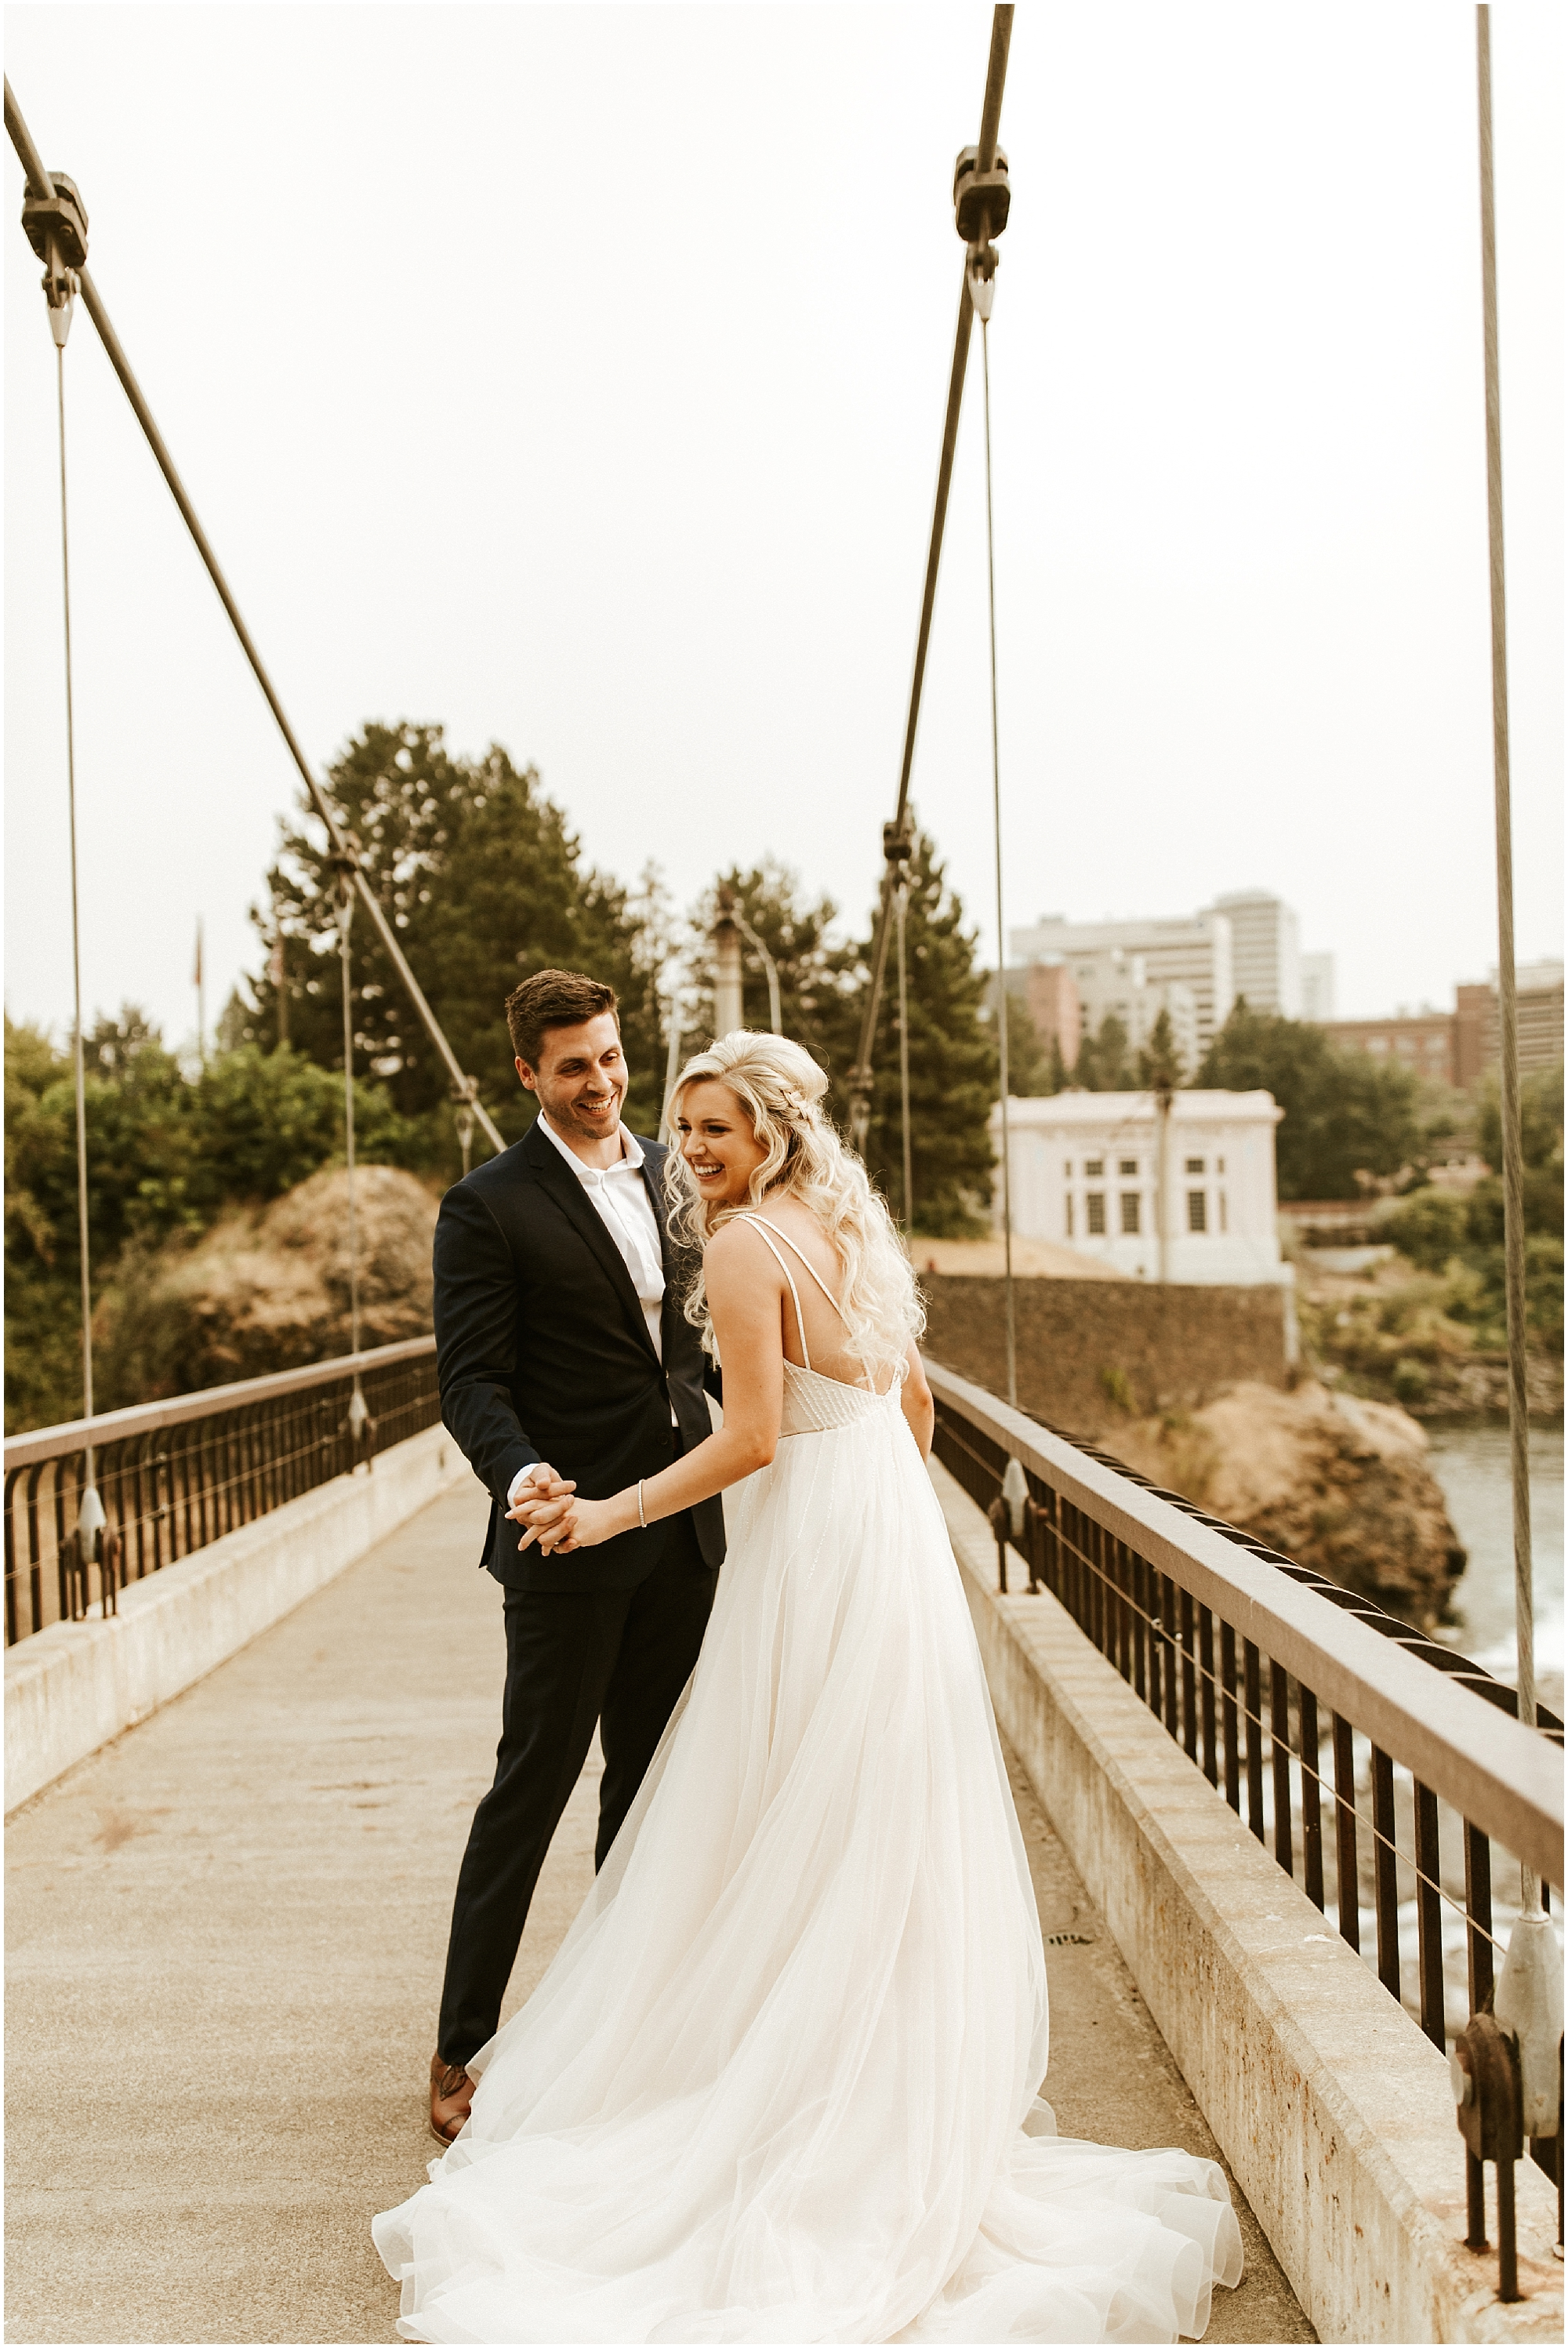 Chateau Rive Spokane Wedding Cassie Trottier Photography1044.jpg